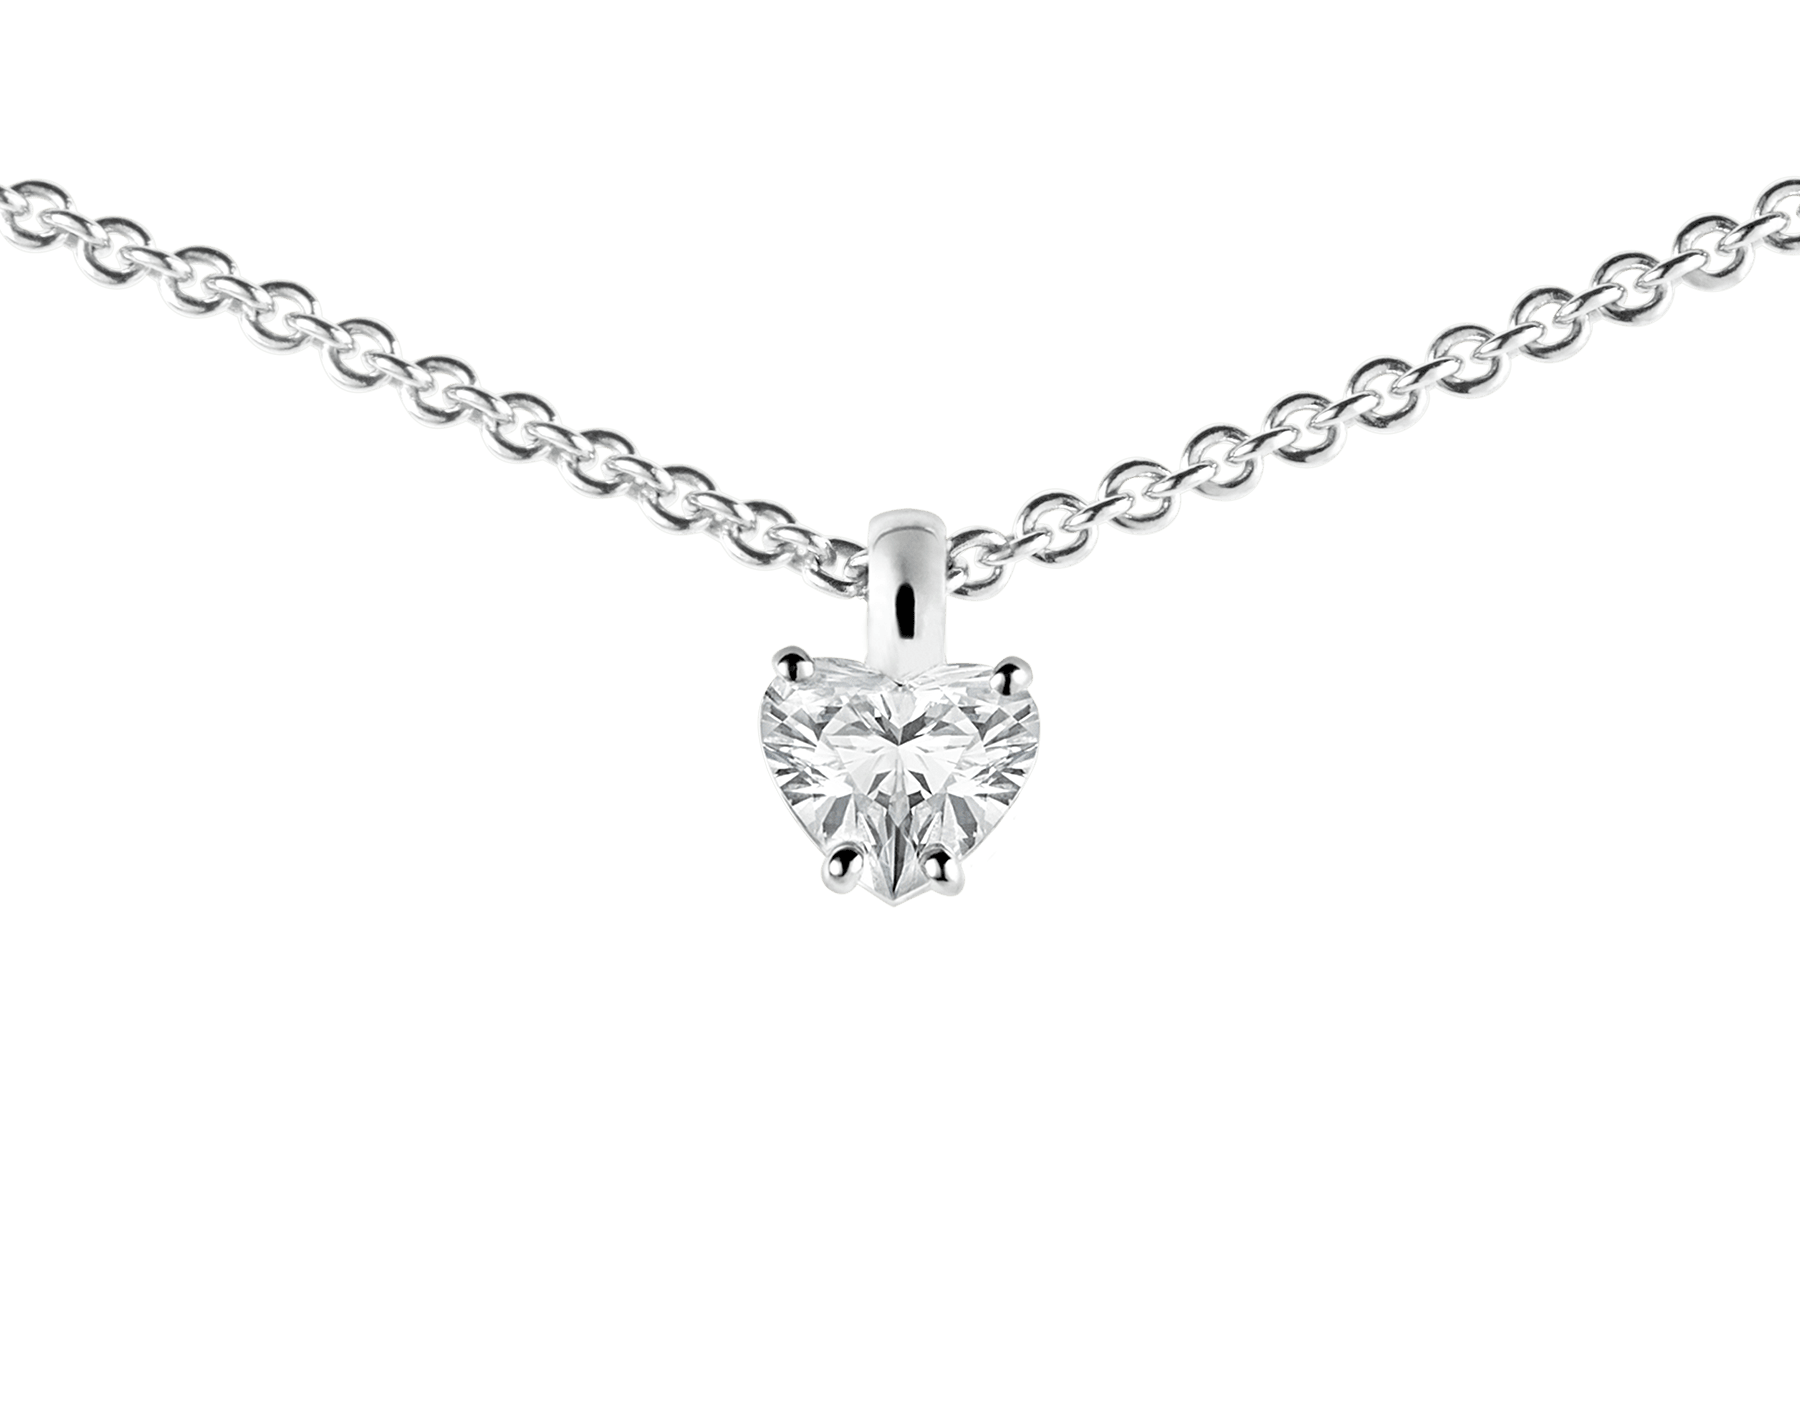 Griffe 18K 白金項墜鑲飾心形切割鑽石,18K 白金鍊帶。 338204 image 2